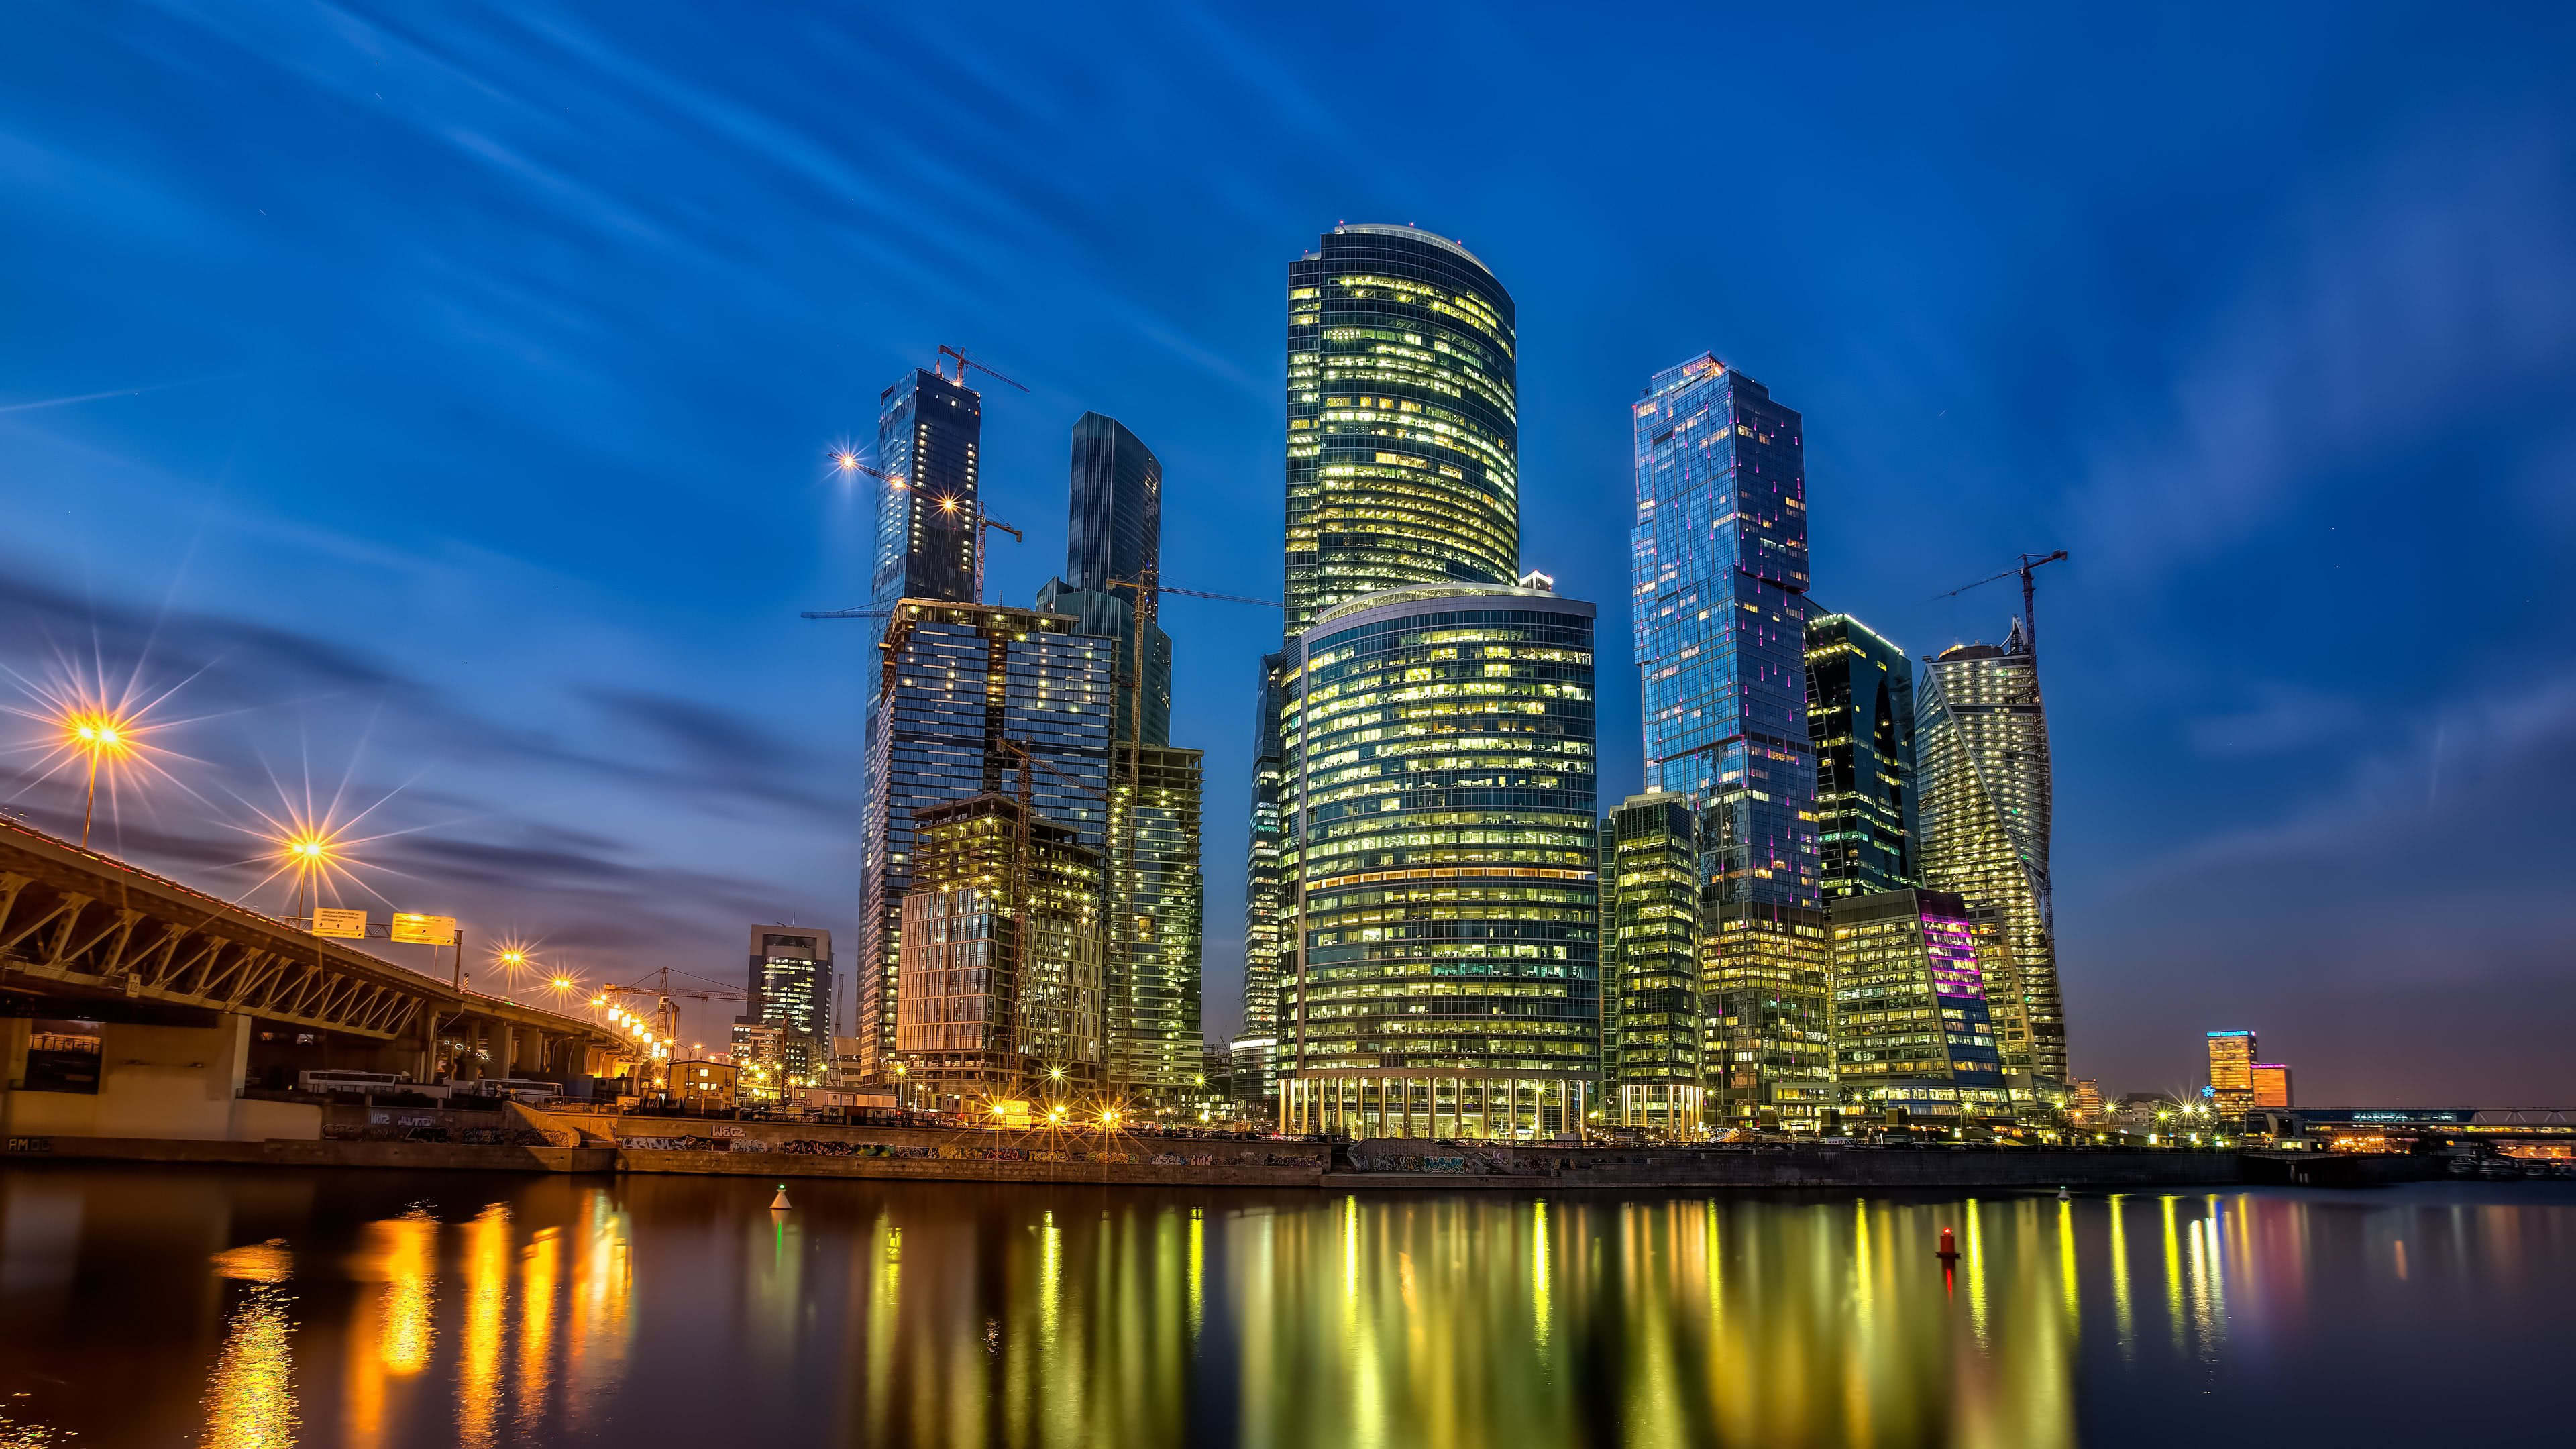 City skyline moscow russia uhd 4k wallpaper pixelz - 4k wallpaper russia ...